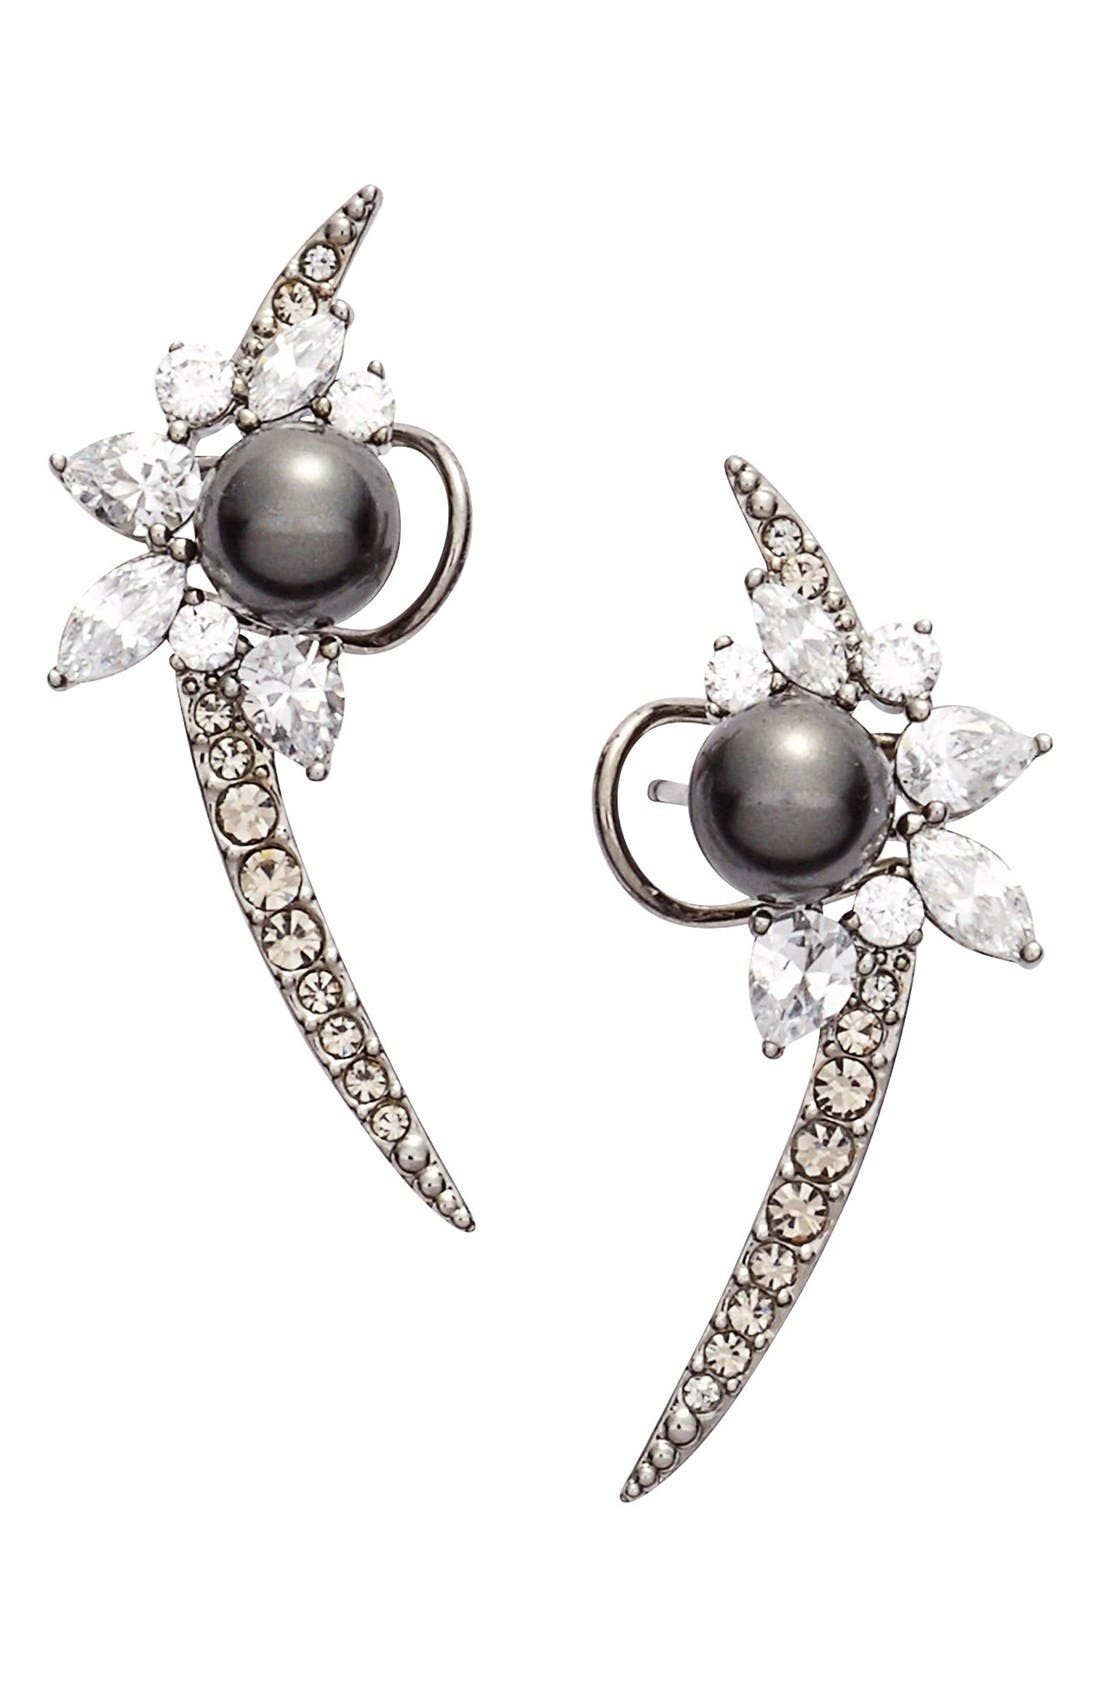 'Pearl Essence' Cubic Zirconia Ear Crawlers,                             Main thumbnail 1, color,                             001